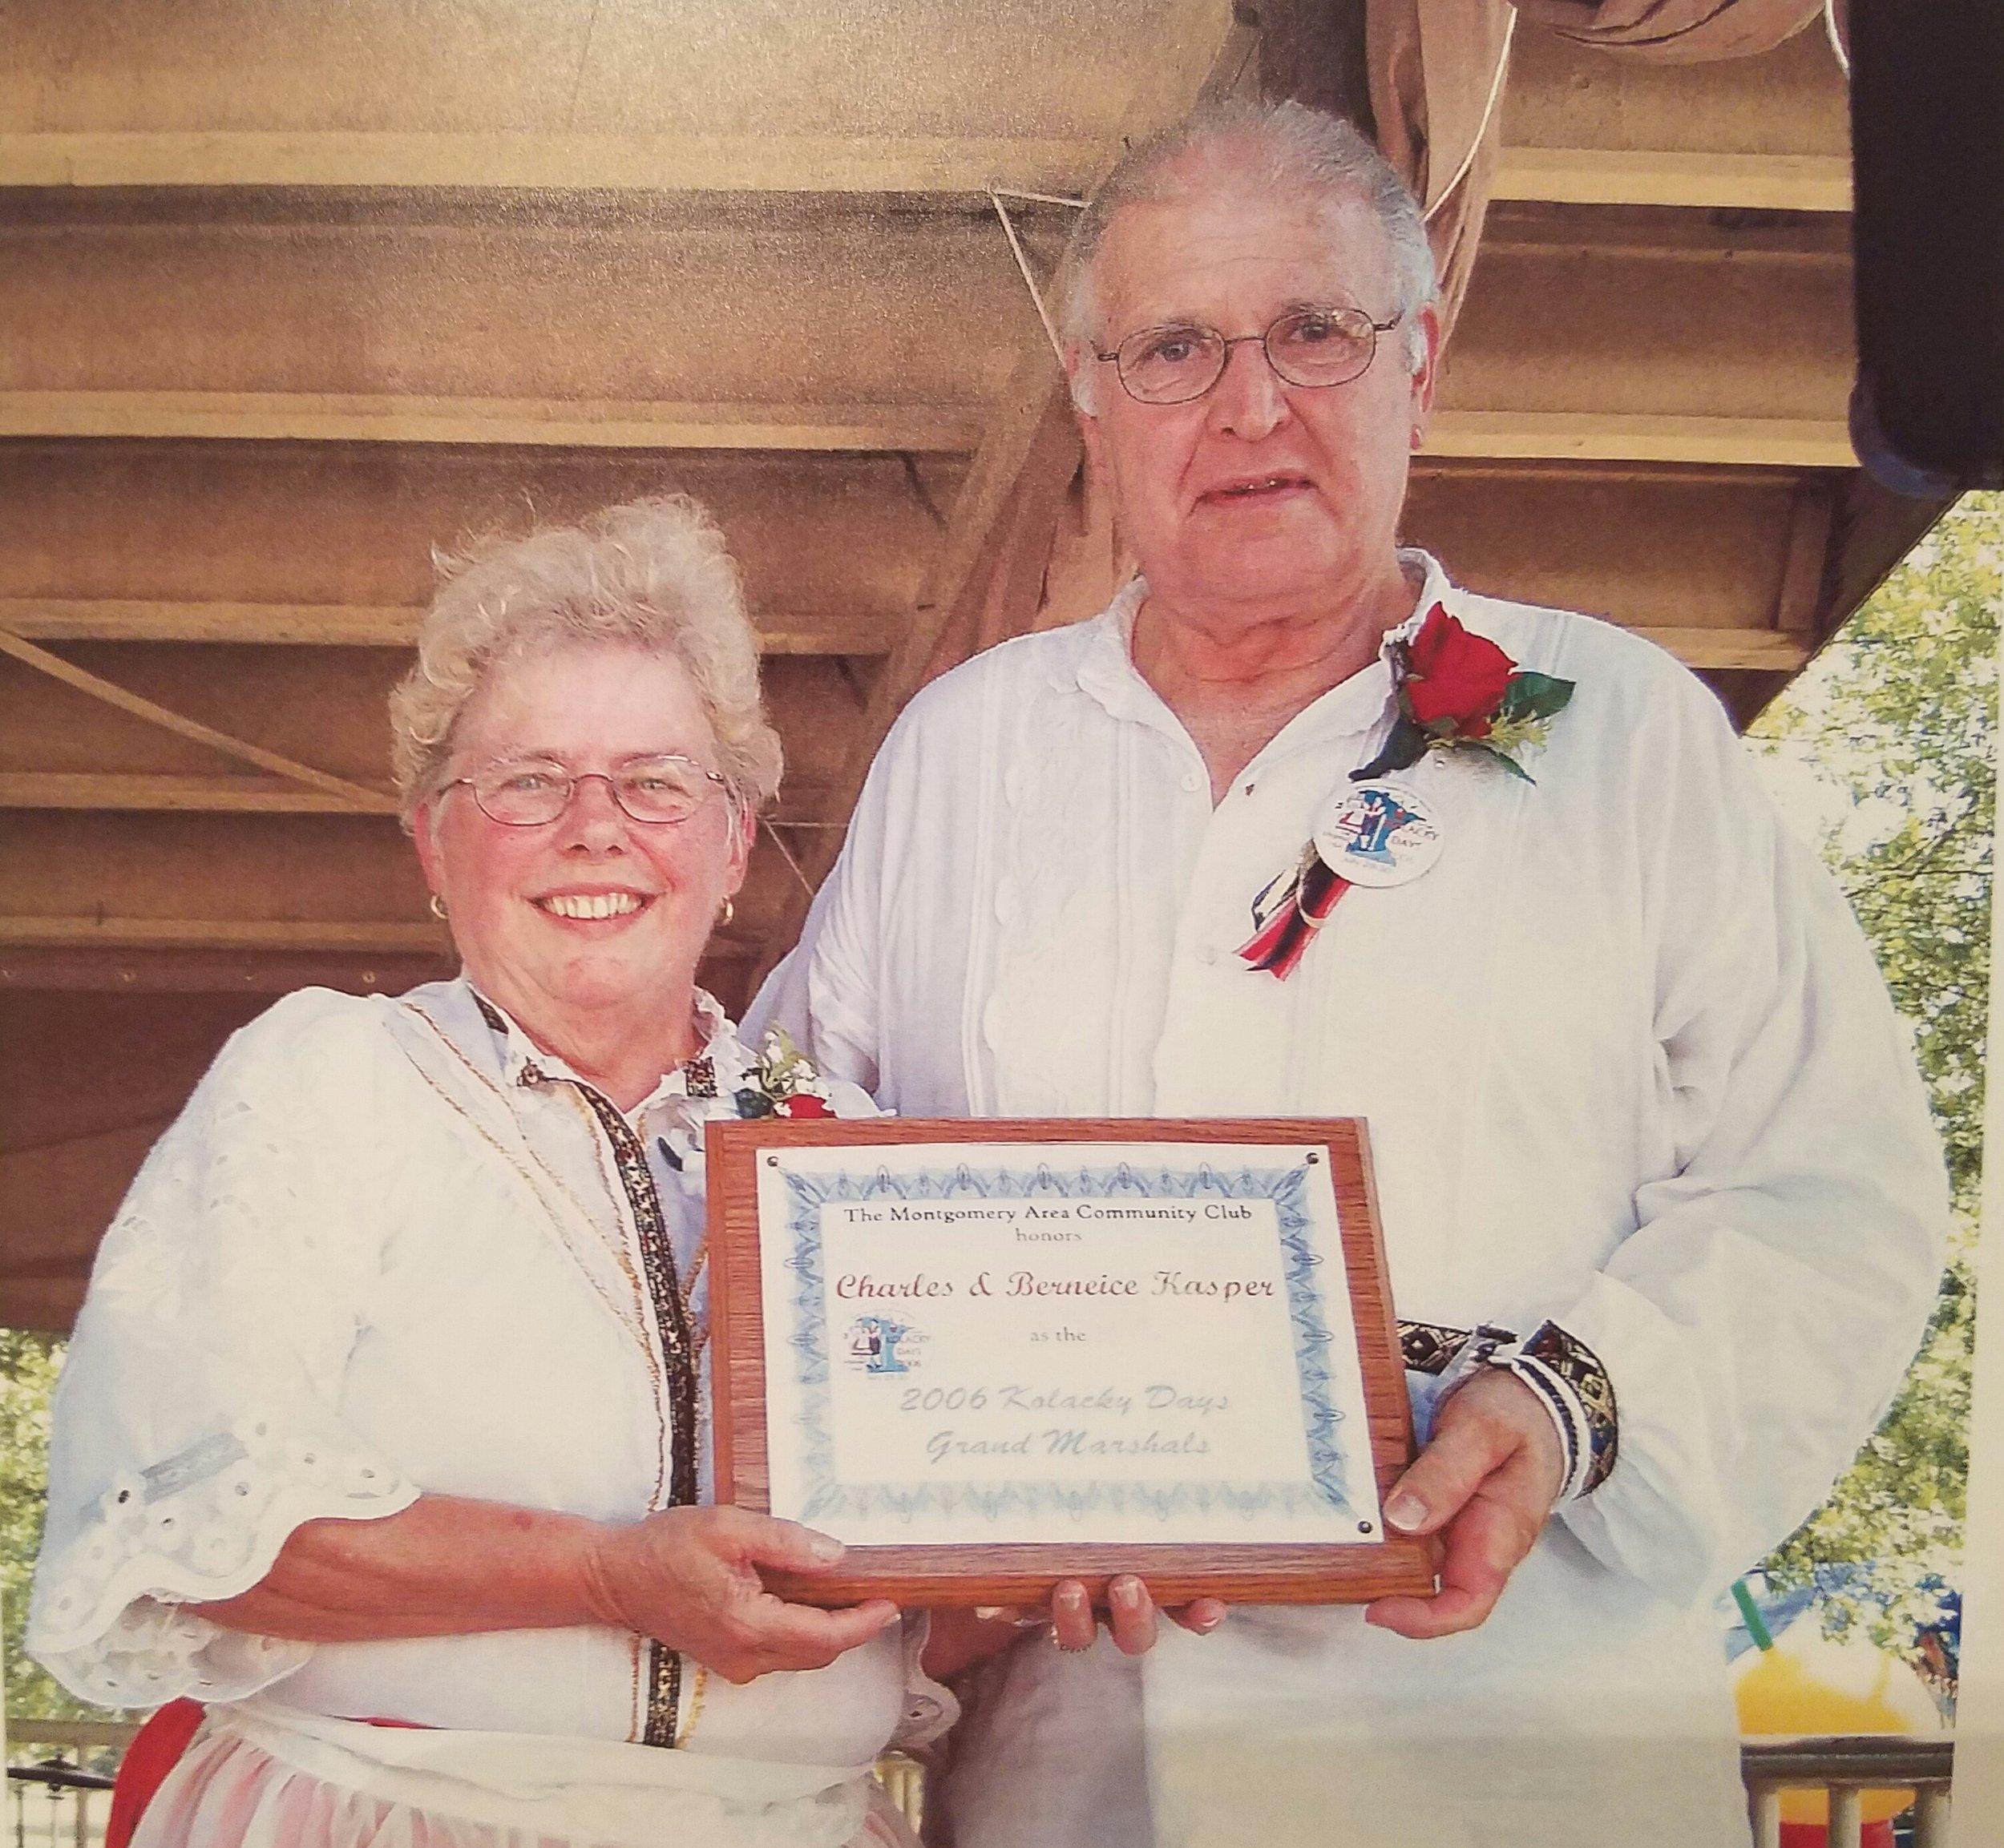 2006 - Chuck & Berneice Kasper